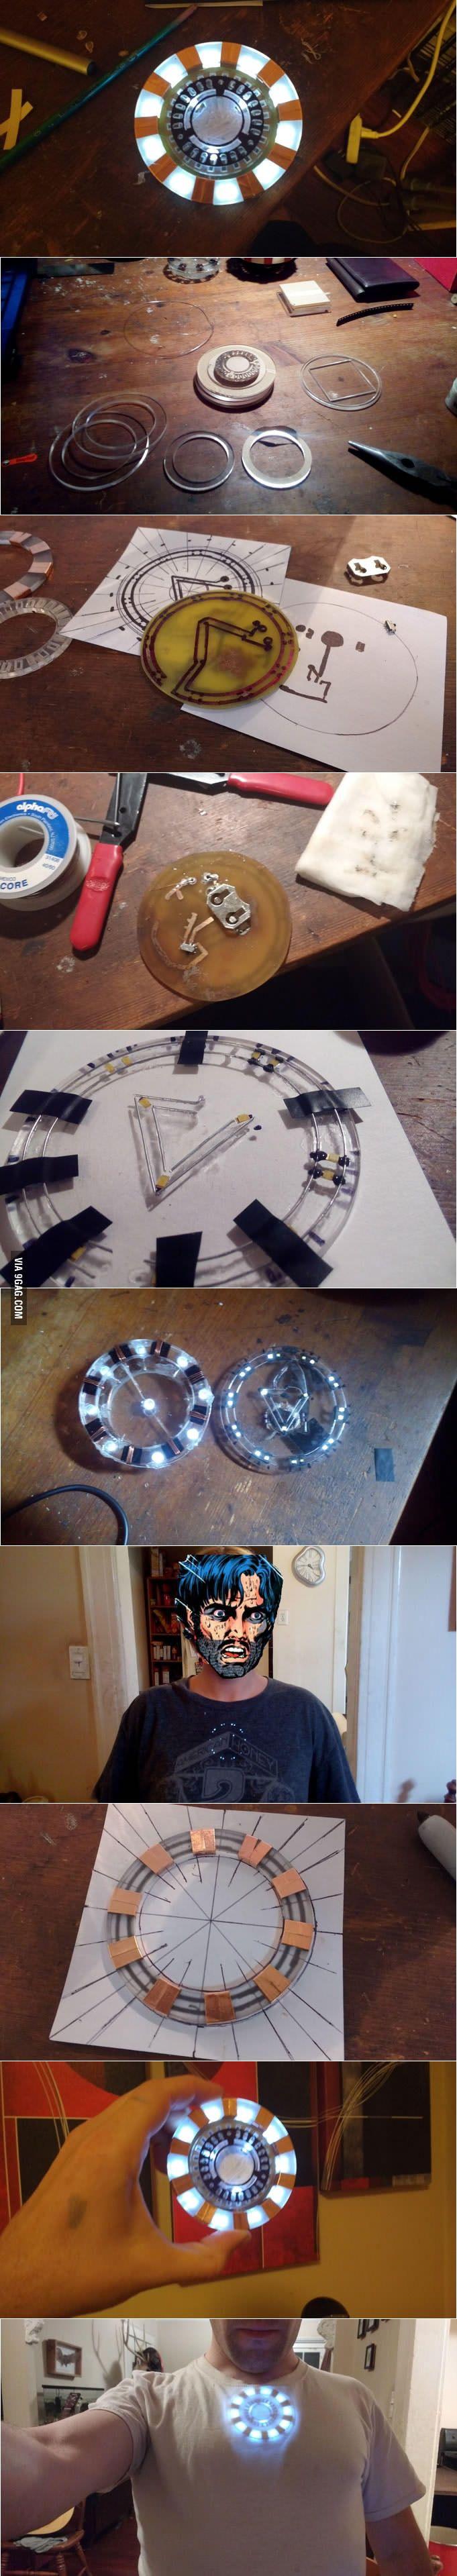 Wearable prosthetic arc reactor for Iron Man/Tony Stark cosplay (Andrew Gross) - 9GAG